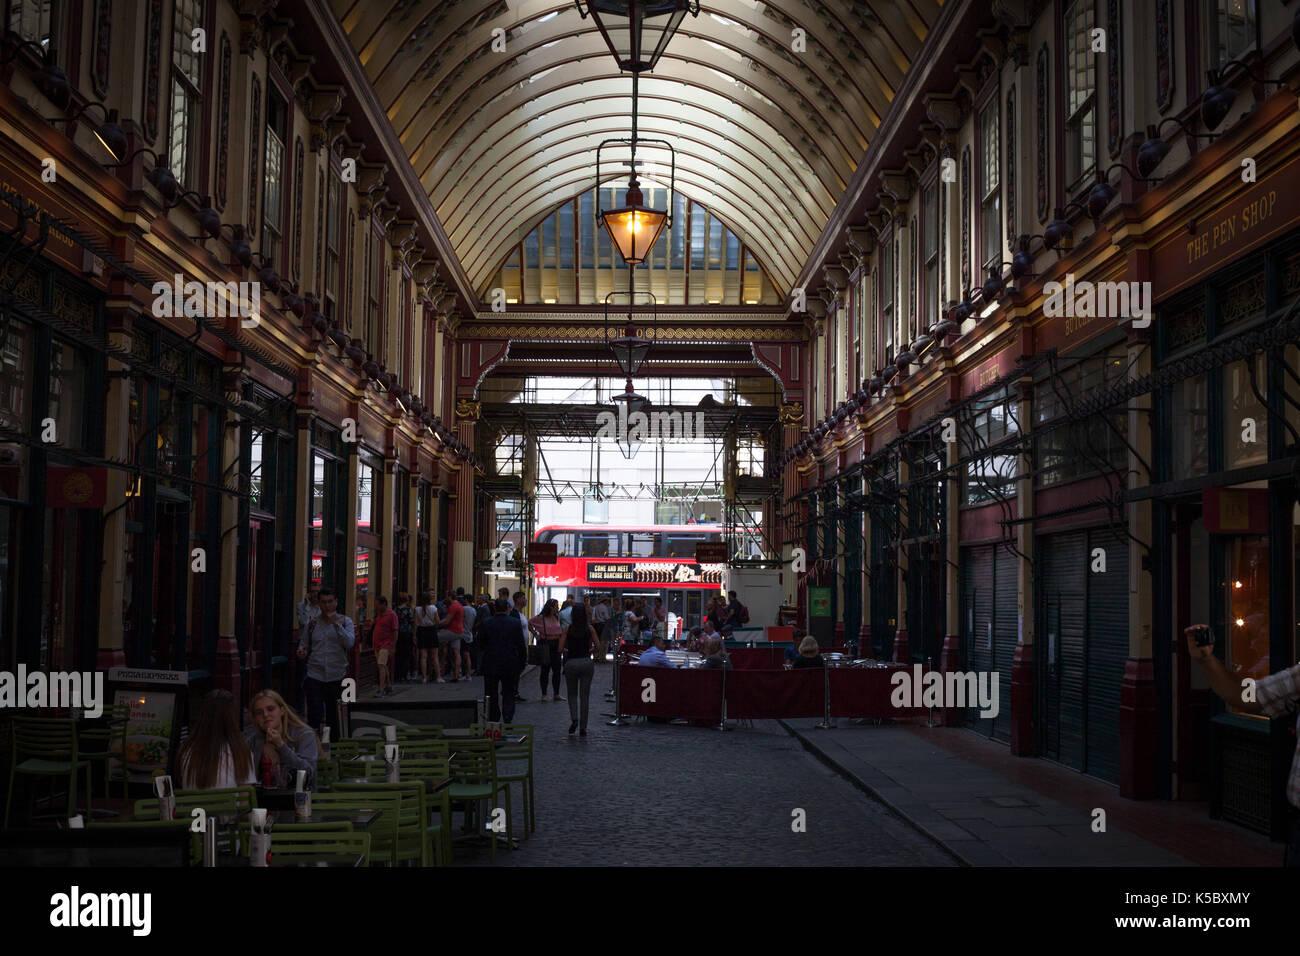 Lights in Leadenhall Market, London, England - Stock Image